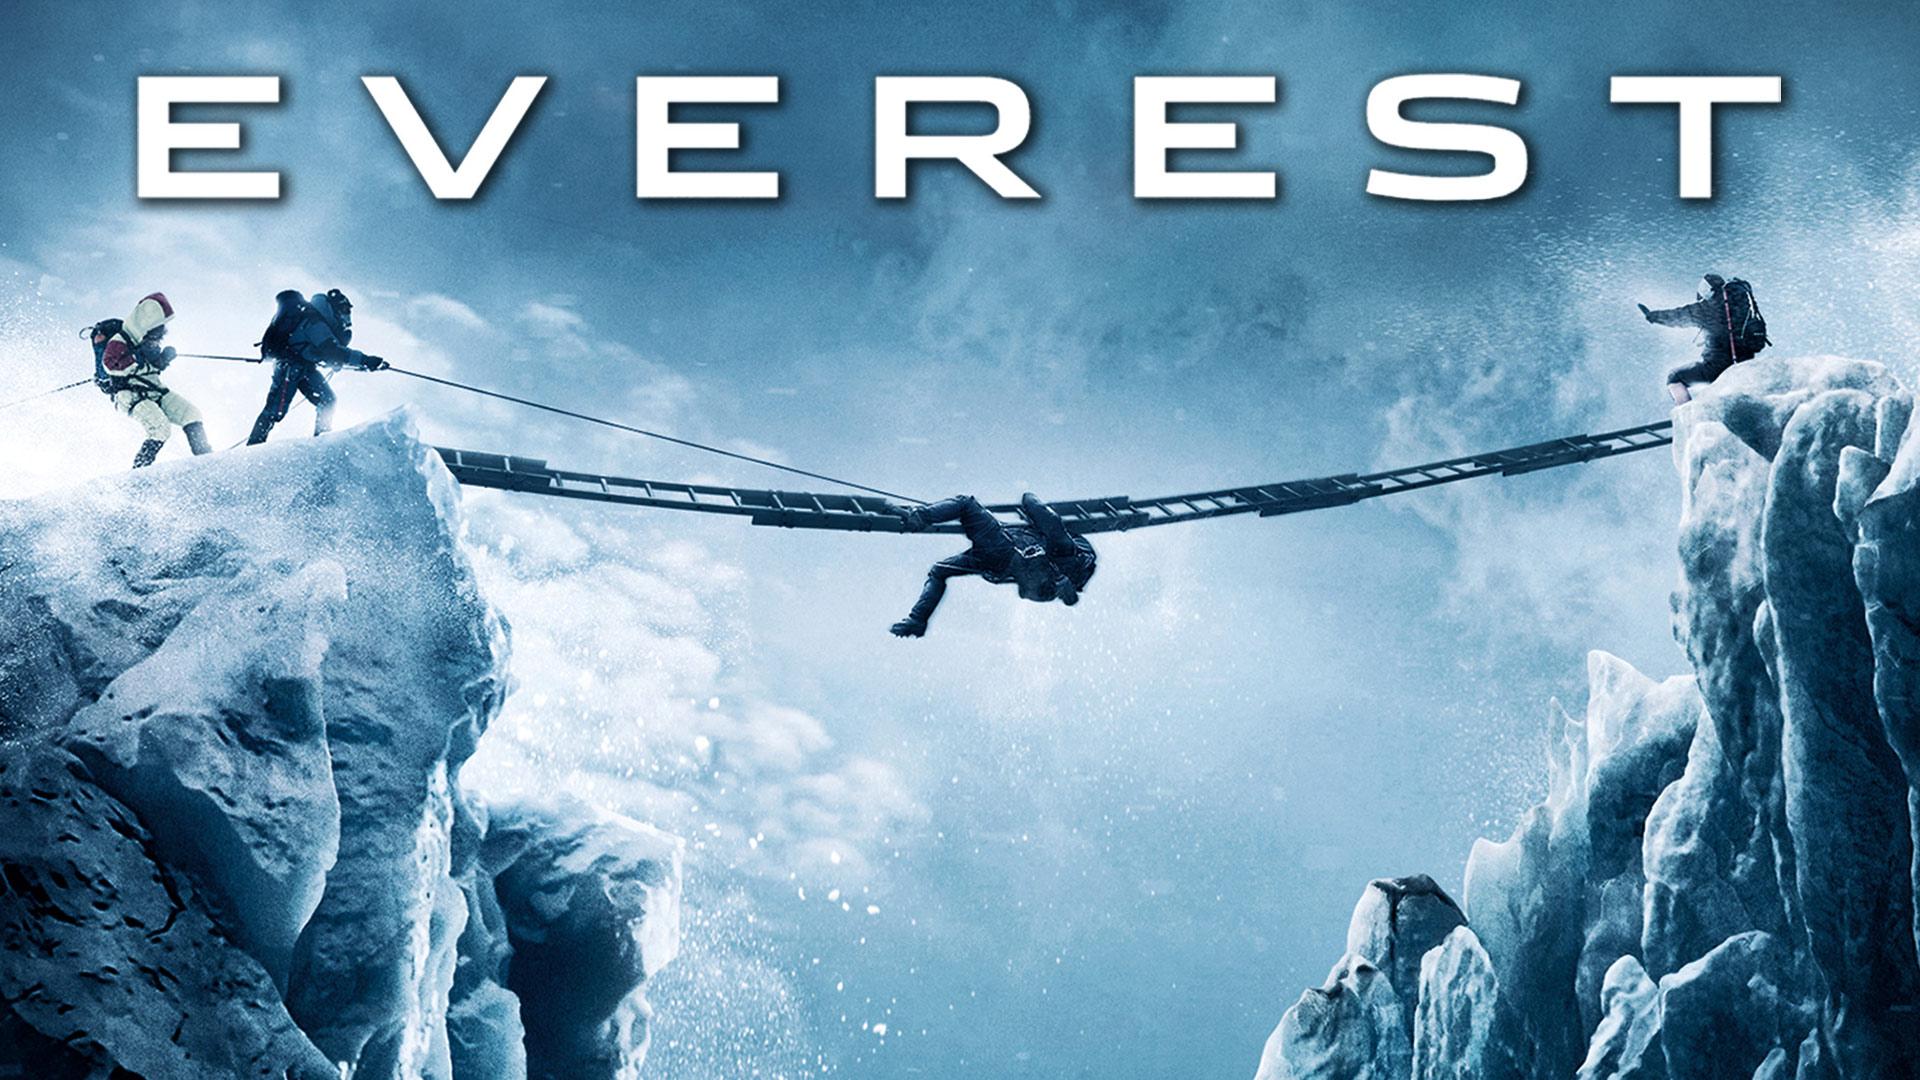 Everest (4K UHD)